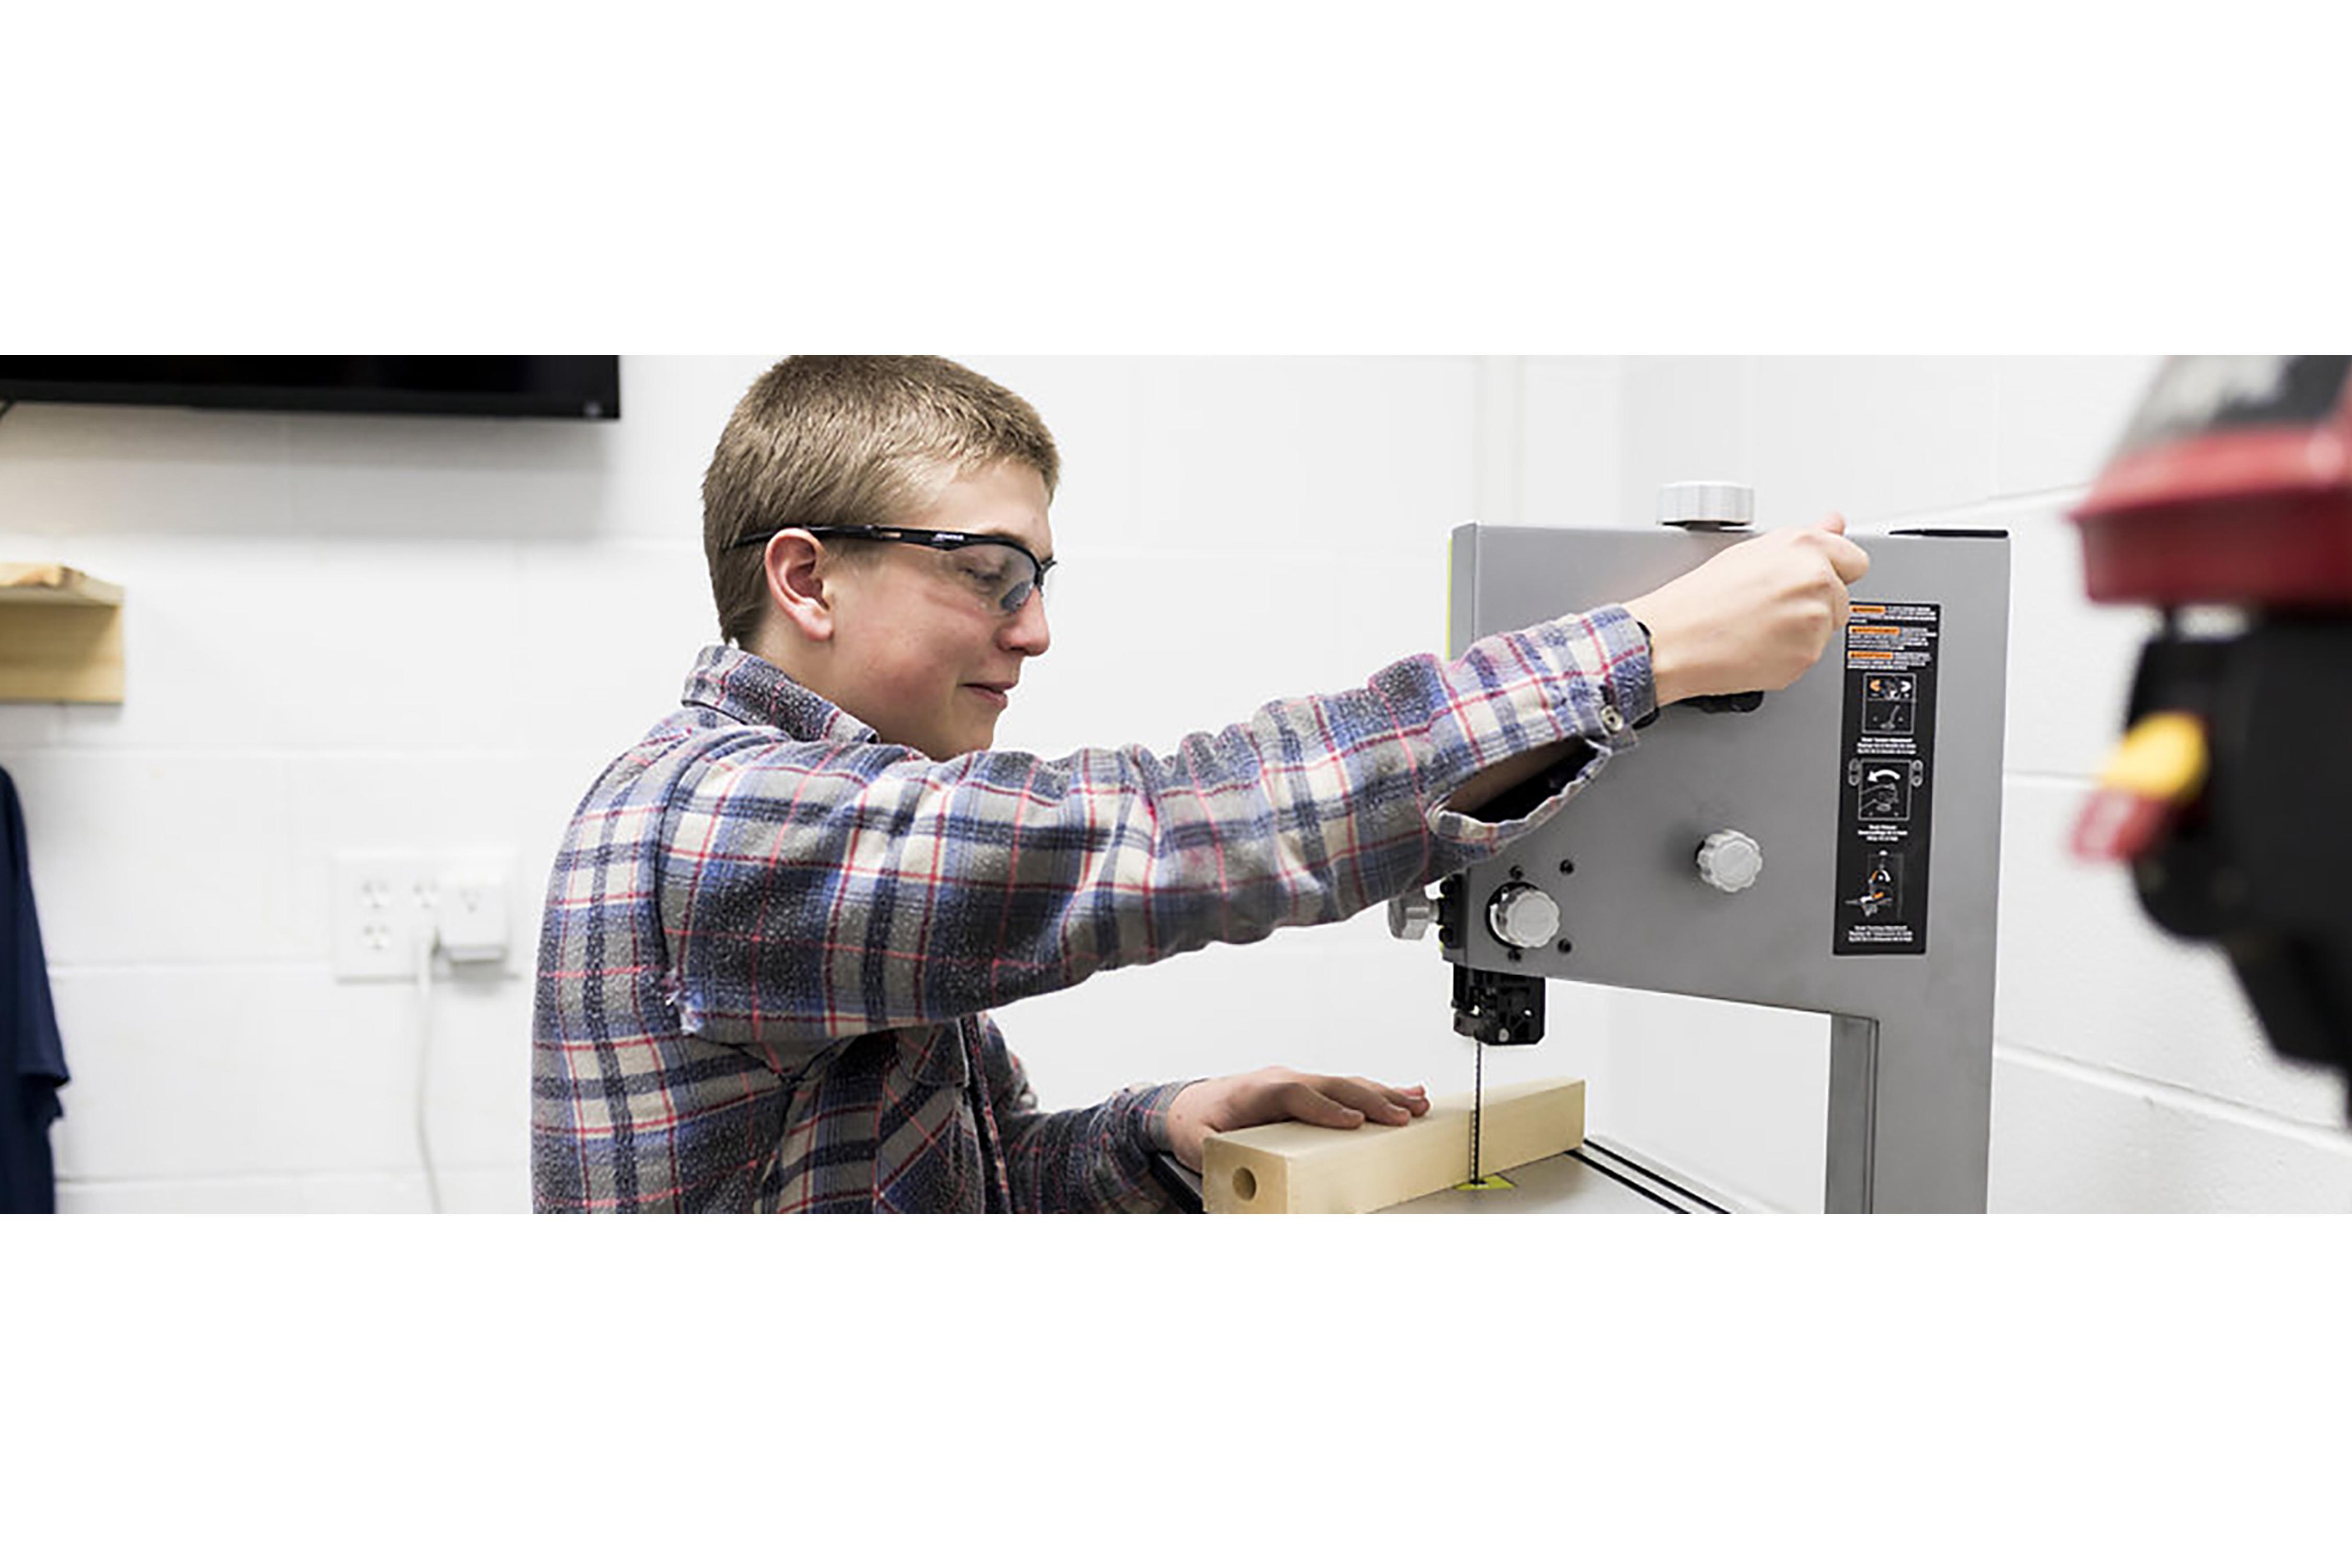 Students using machines